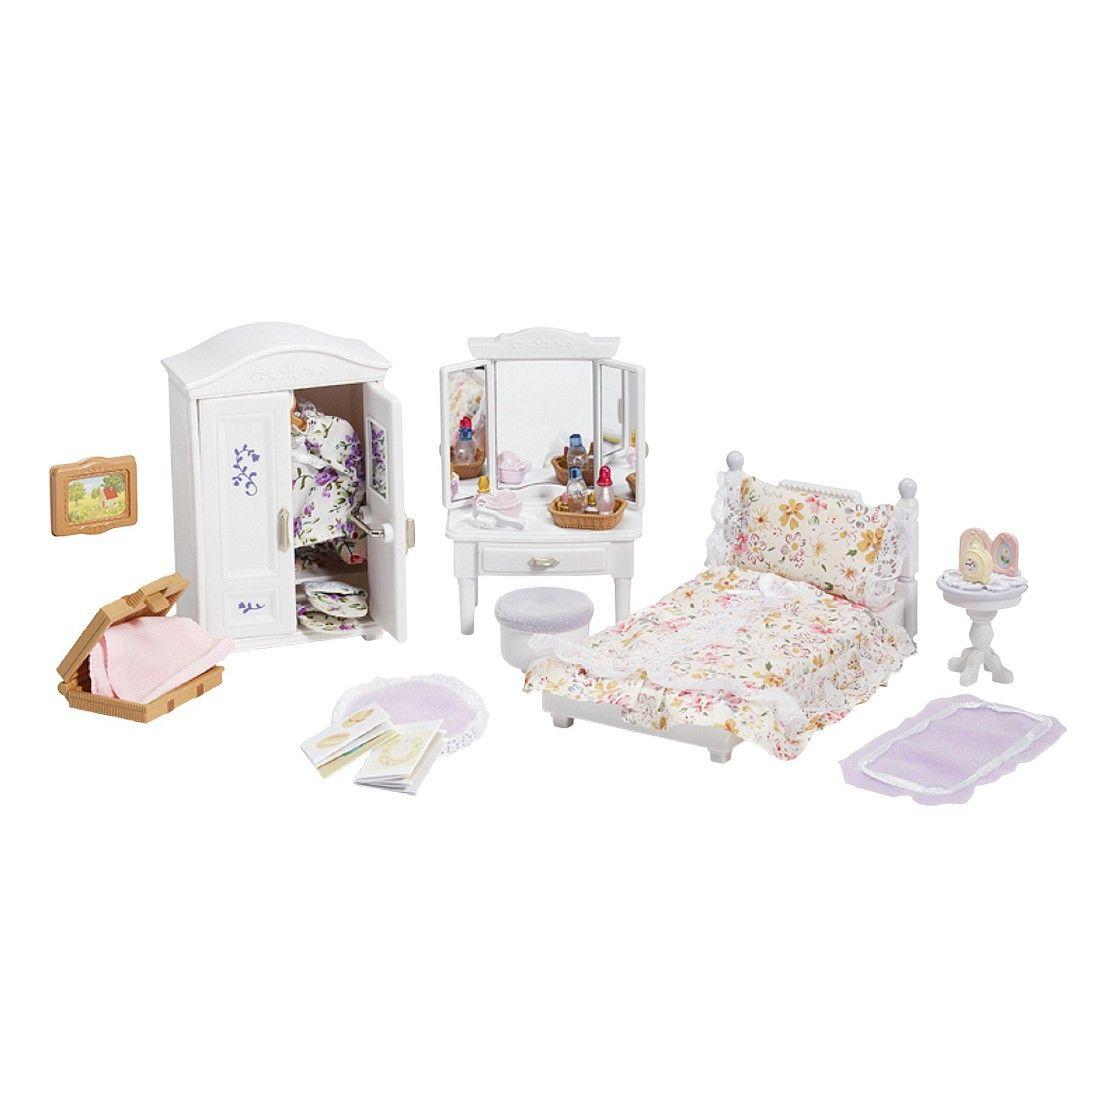 calico critters girls bedroom set  muebles para muñecas